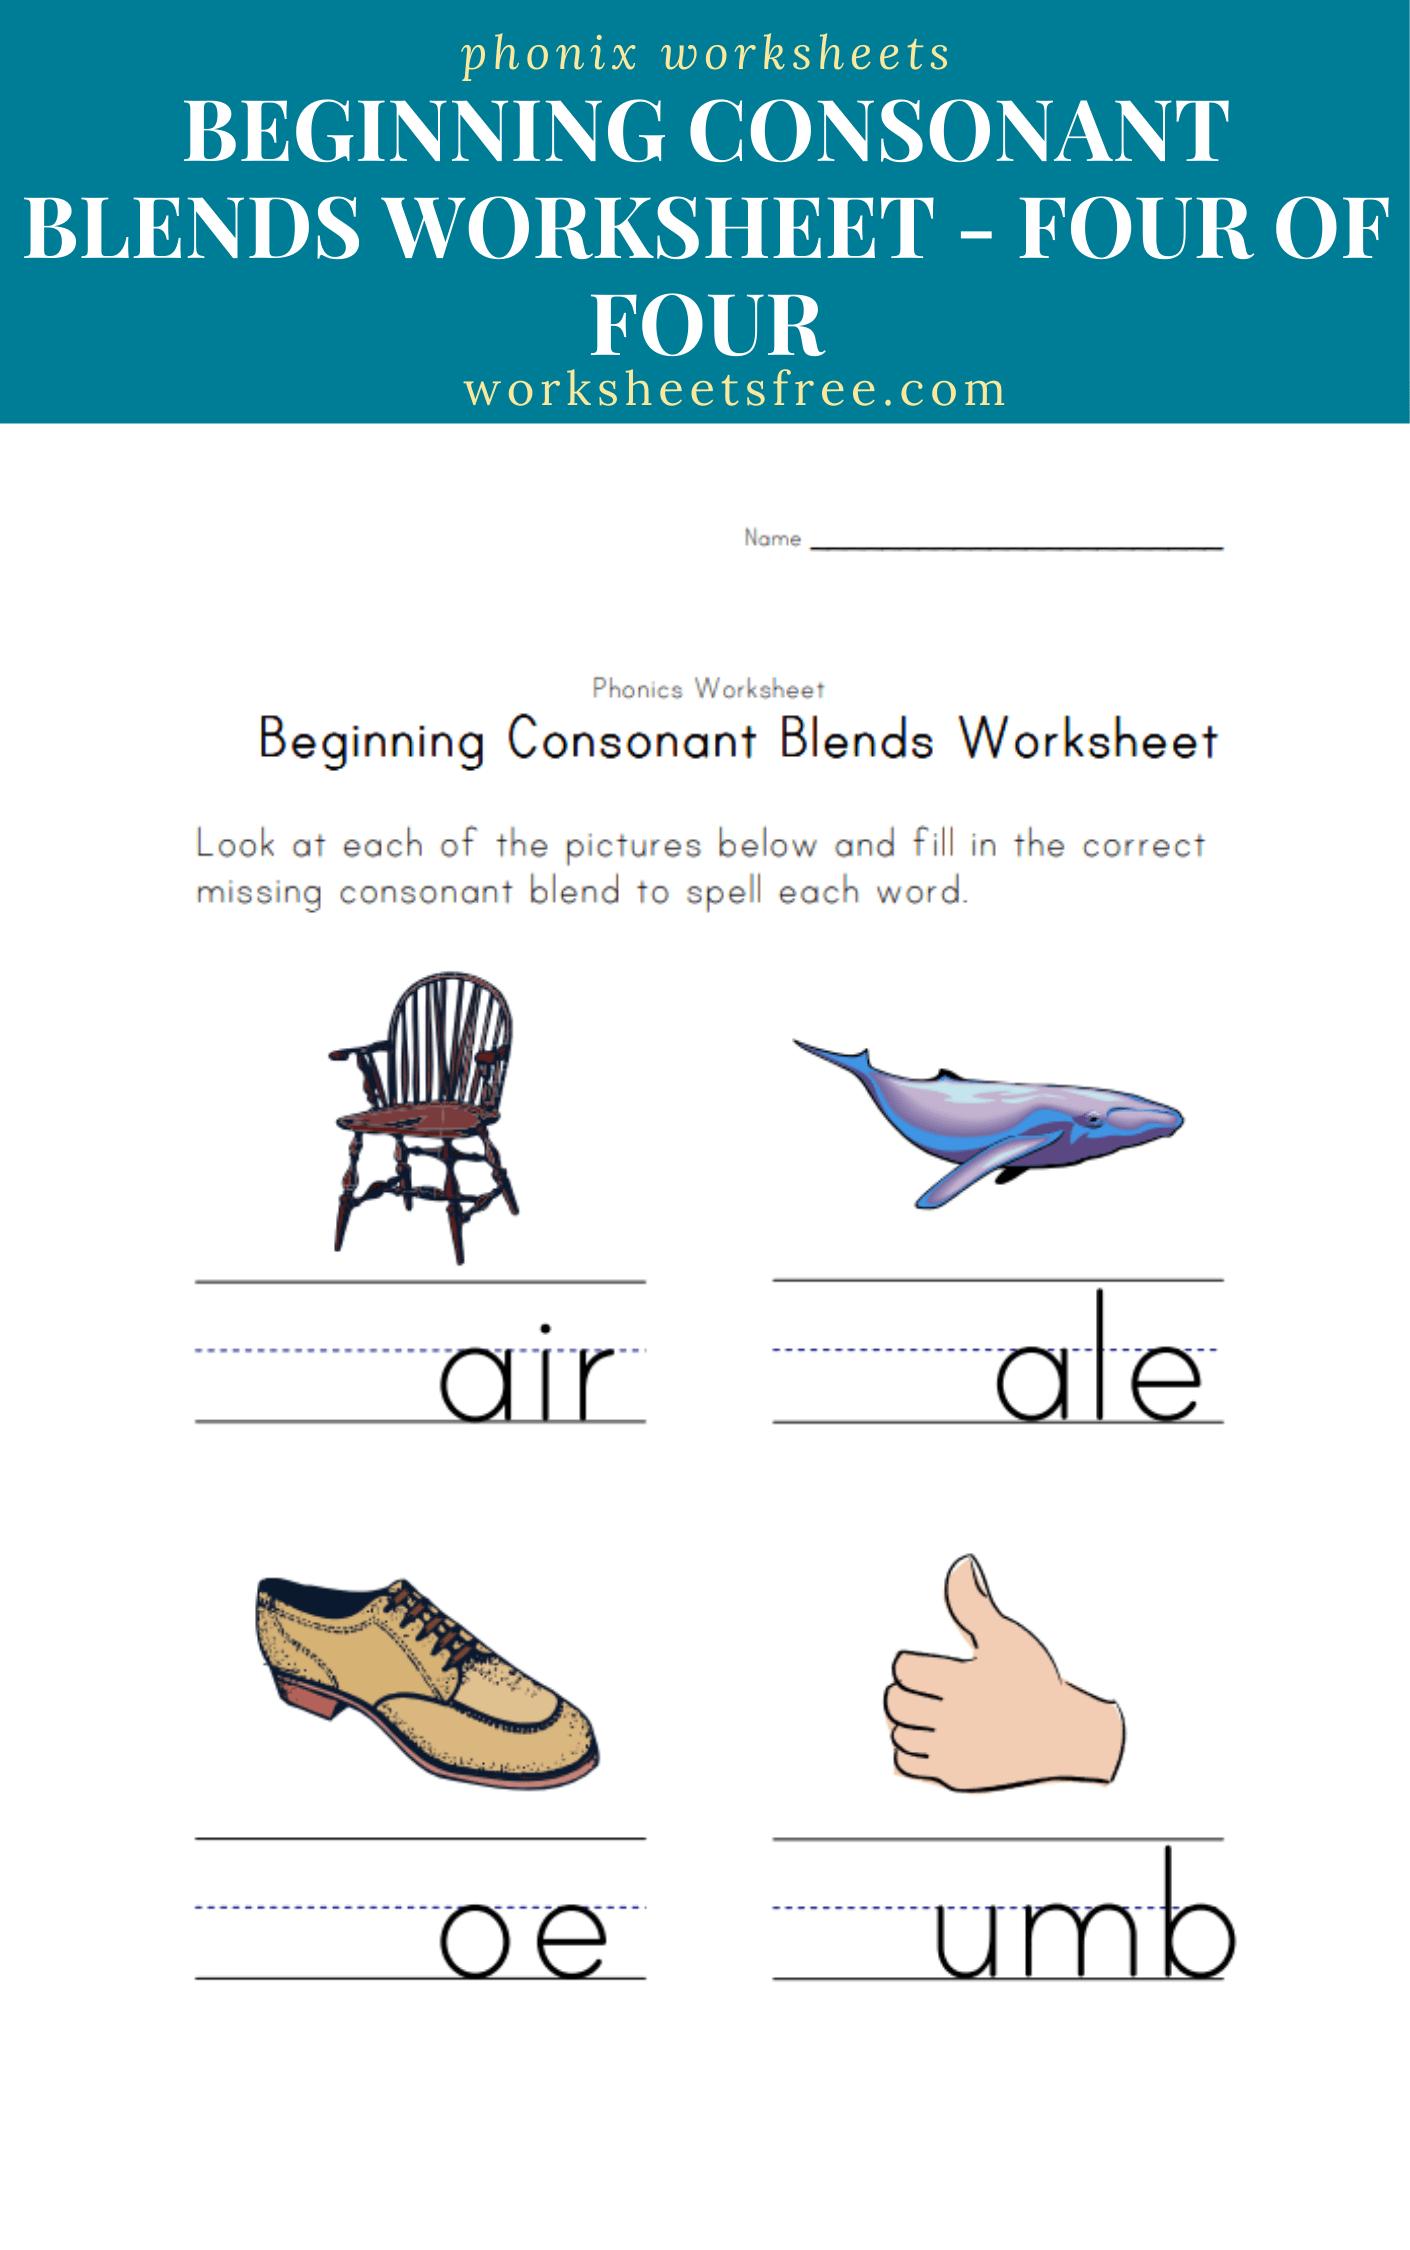 Beginning-Consonant-Blends-Worksheet-Four-of-Four   Worksheets Free [ 2250 x 1410 Pixel ]